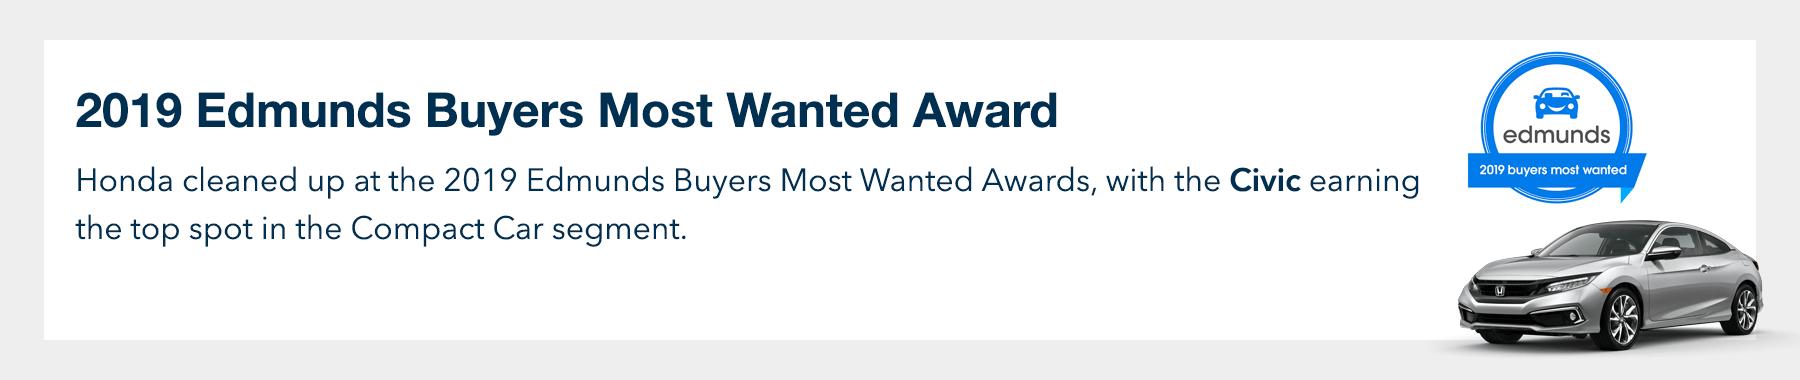 2019 Honda Civic Coupe Edmunds Buyers Most Wanted Award Slider